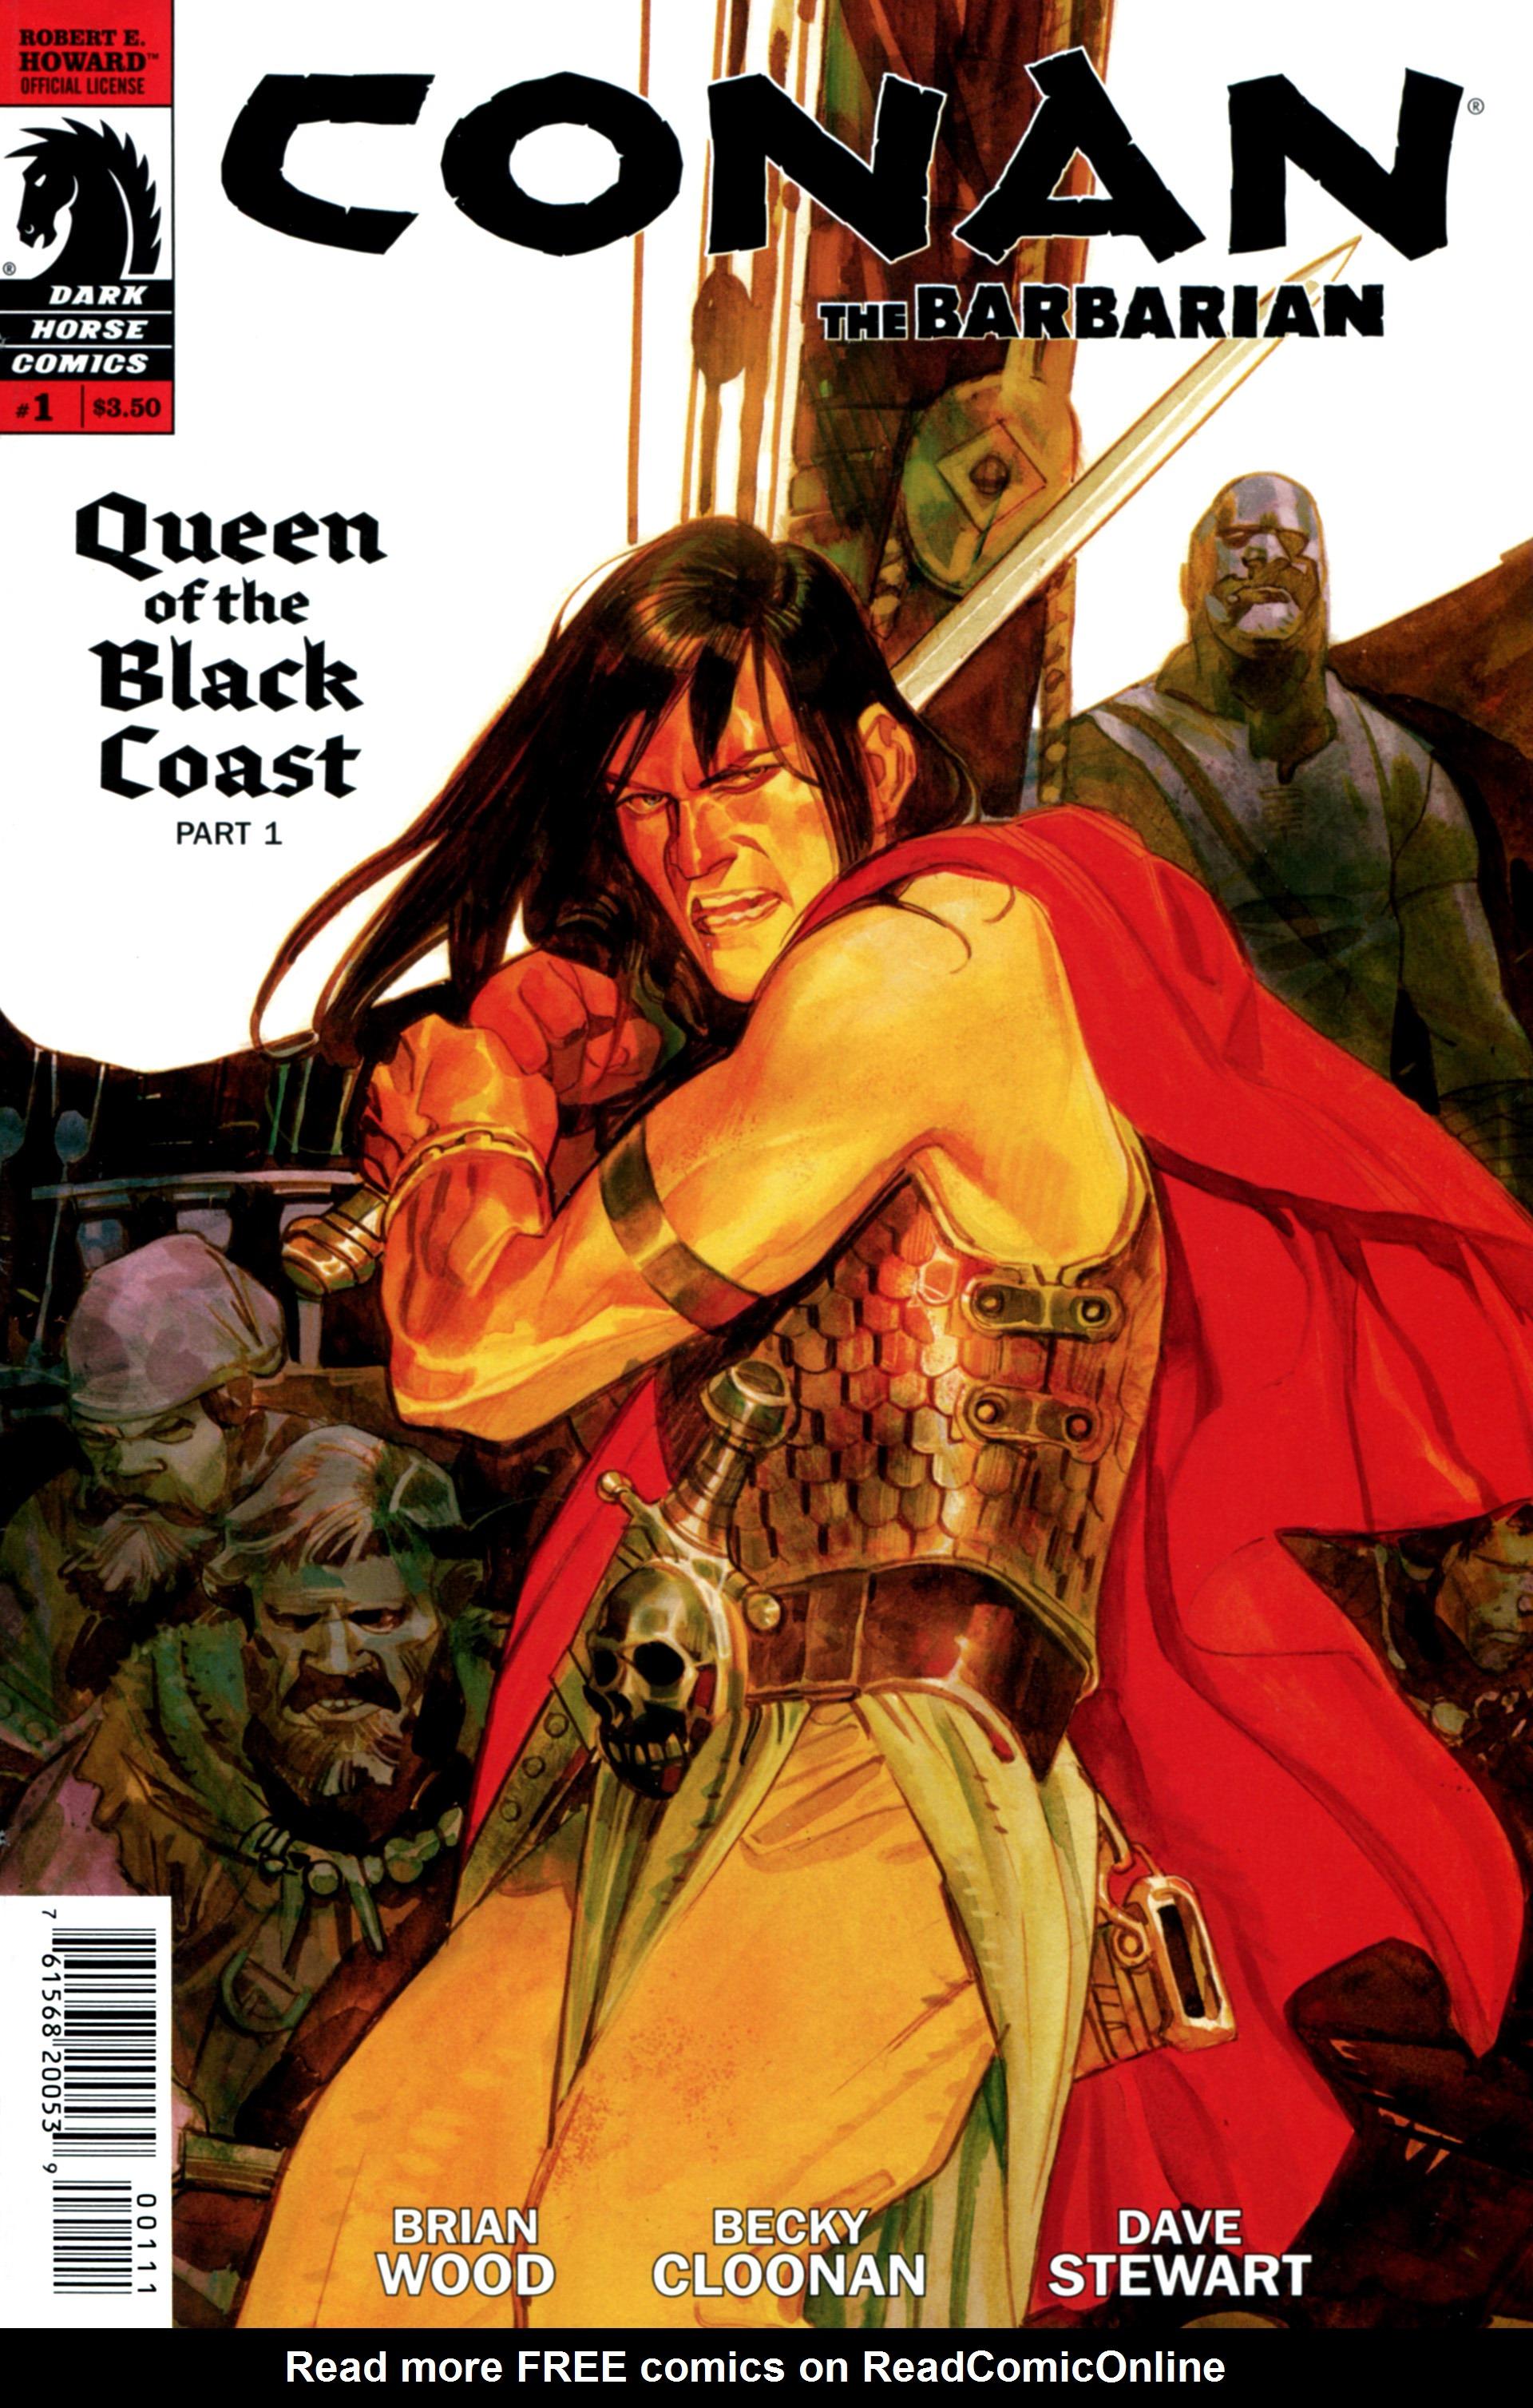 Conan the Barbarian (2012) 1 Page 1